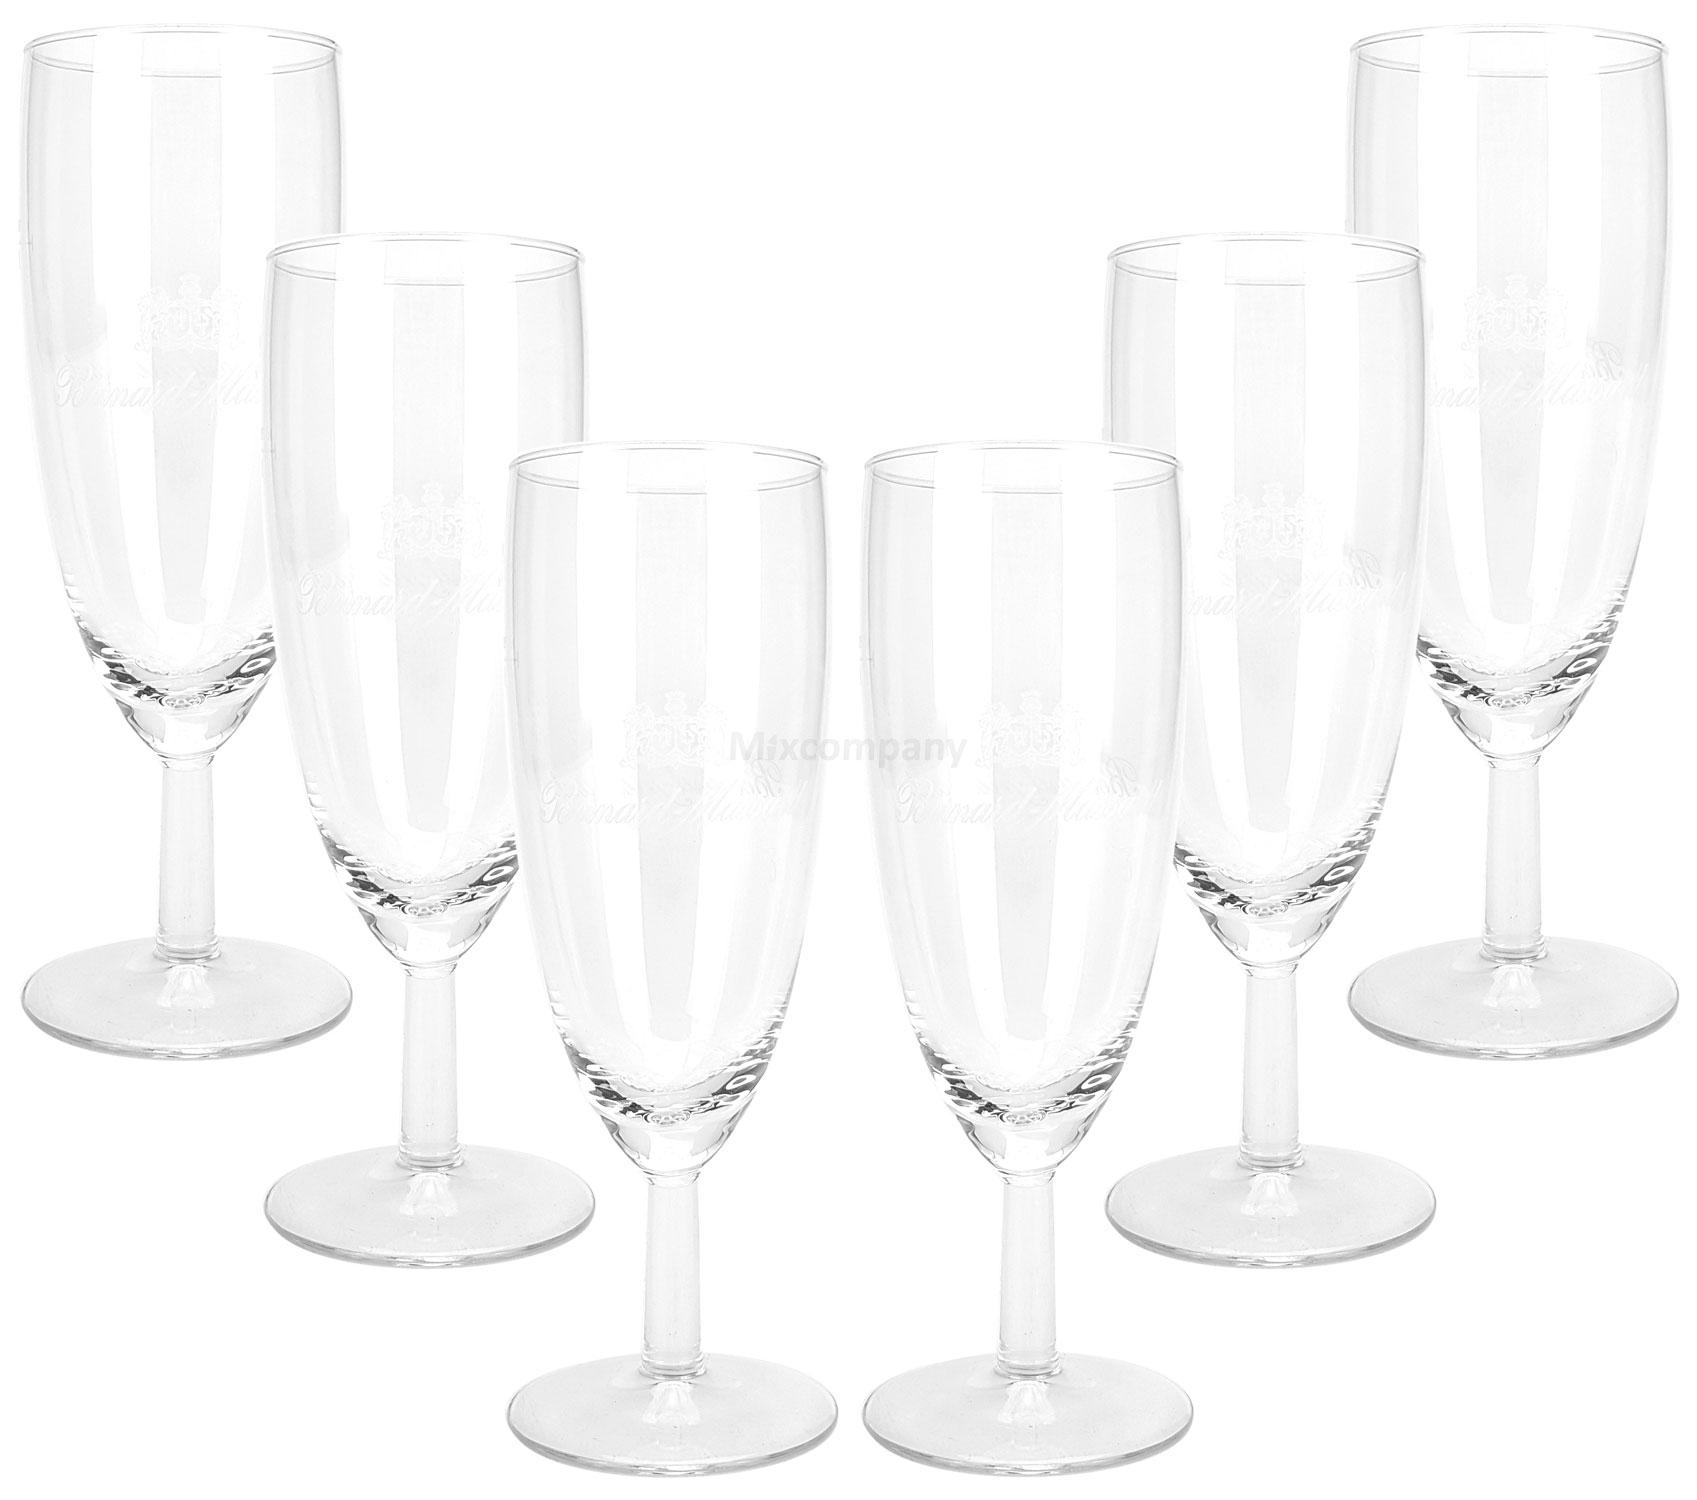 Bernard Massard Champagner Prosecco Glas Gläser Set - 6x Sektgläser 0,1l geeicht